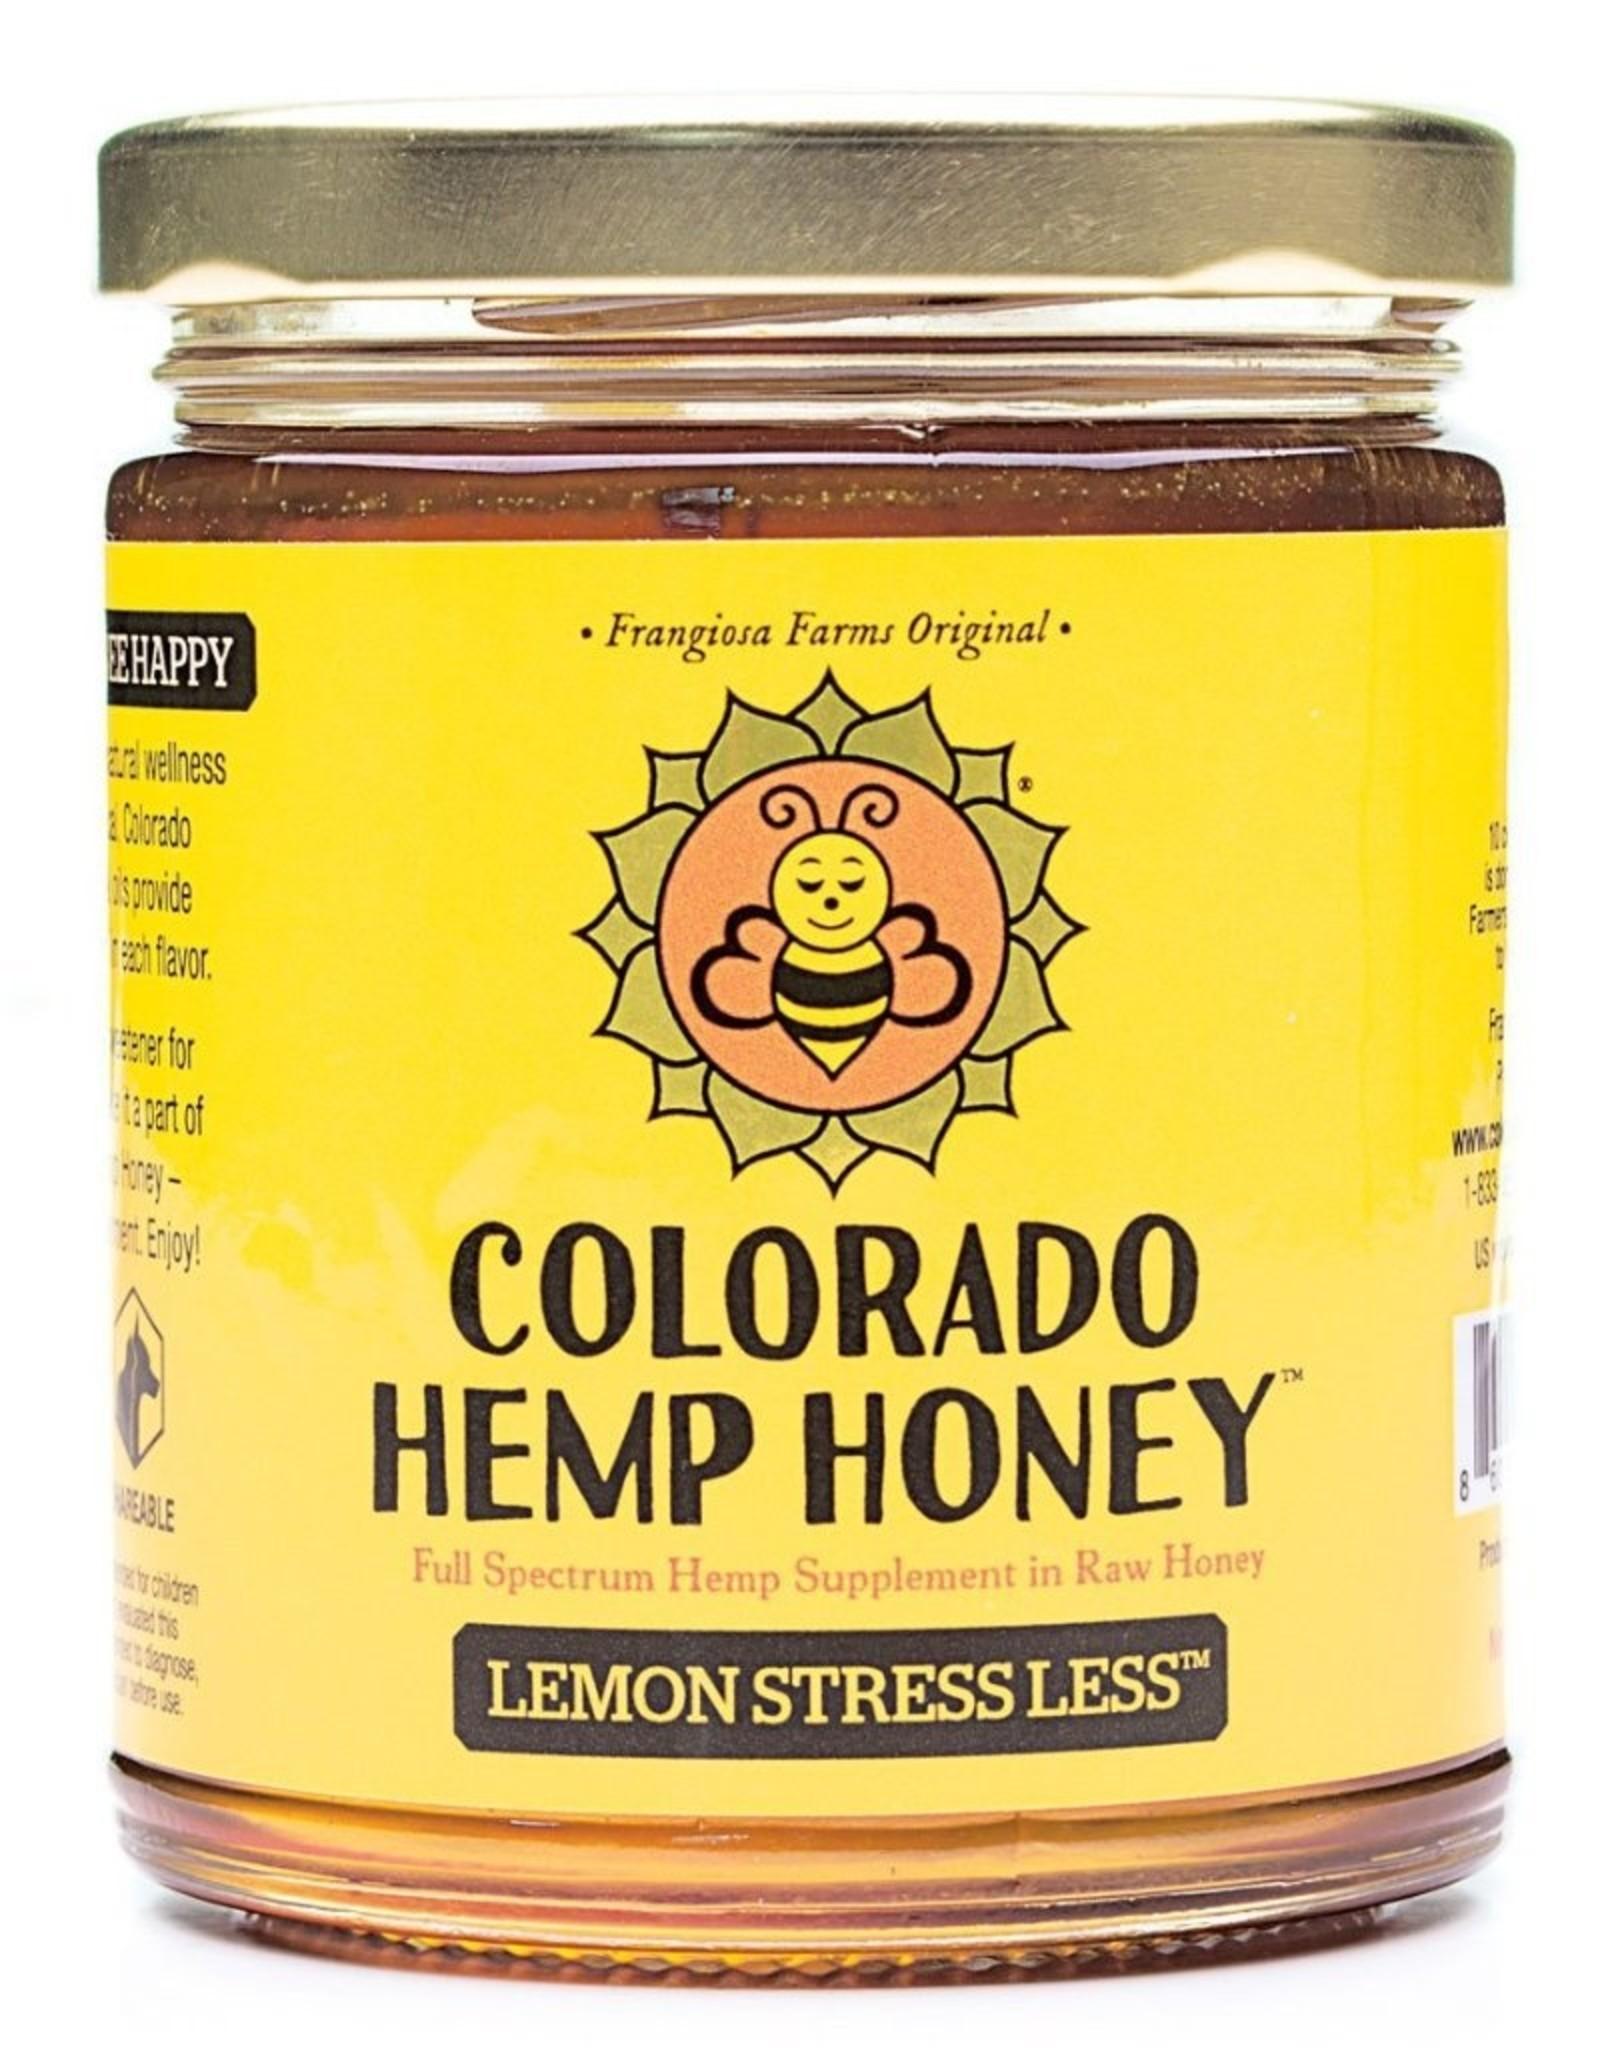 Colorado Hemp Honey Lemon Stress Less Jar - 6oz